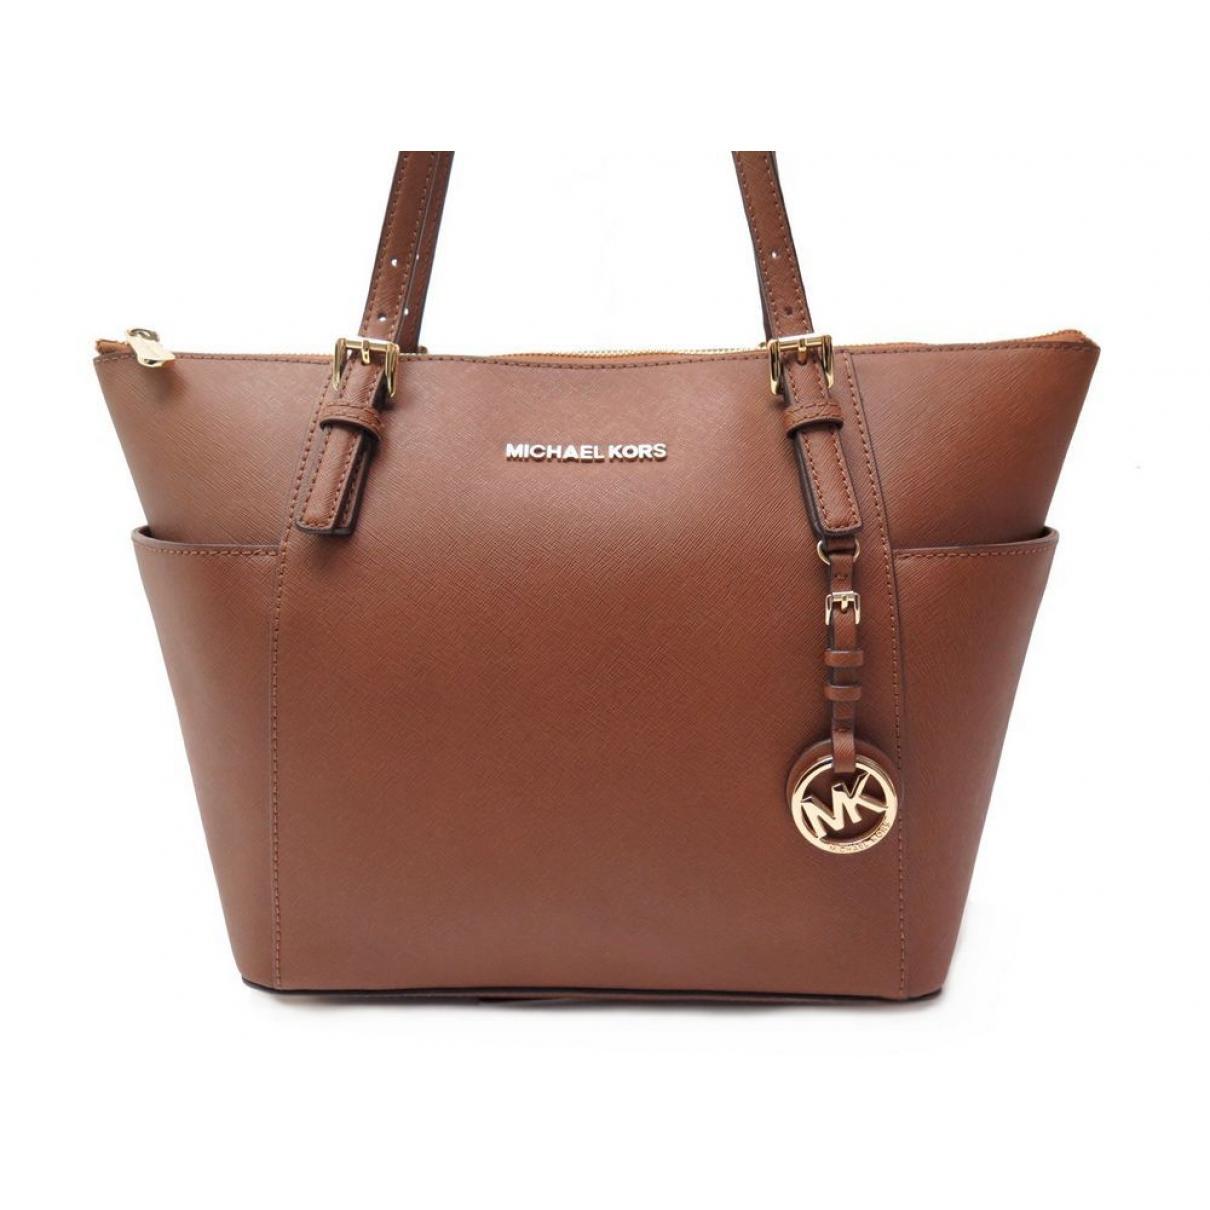 Michael Kors Brown Pre Owned Leather Handbag Lyst View Fullscreen